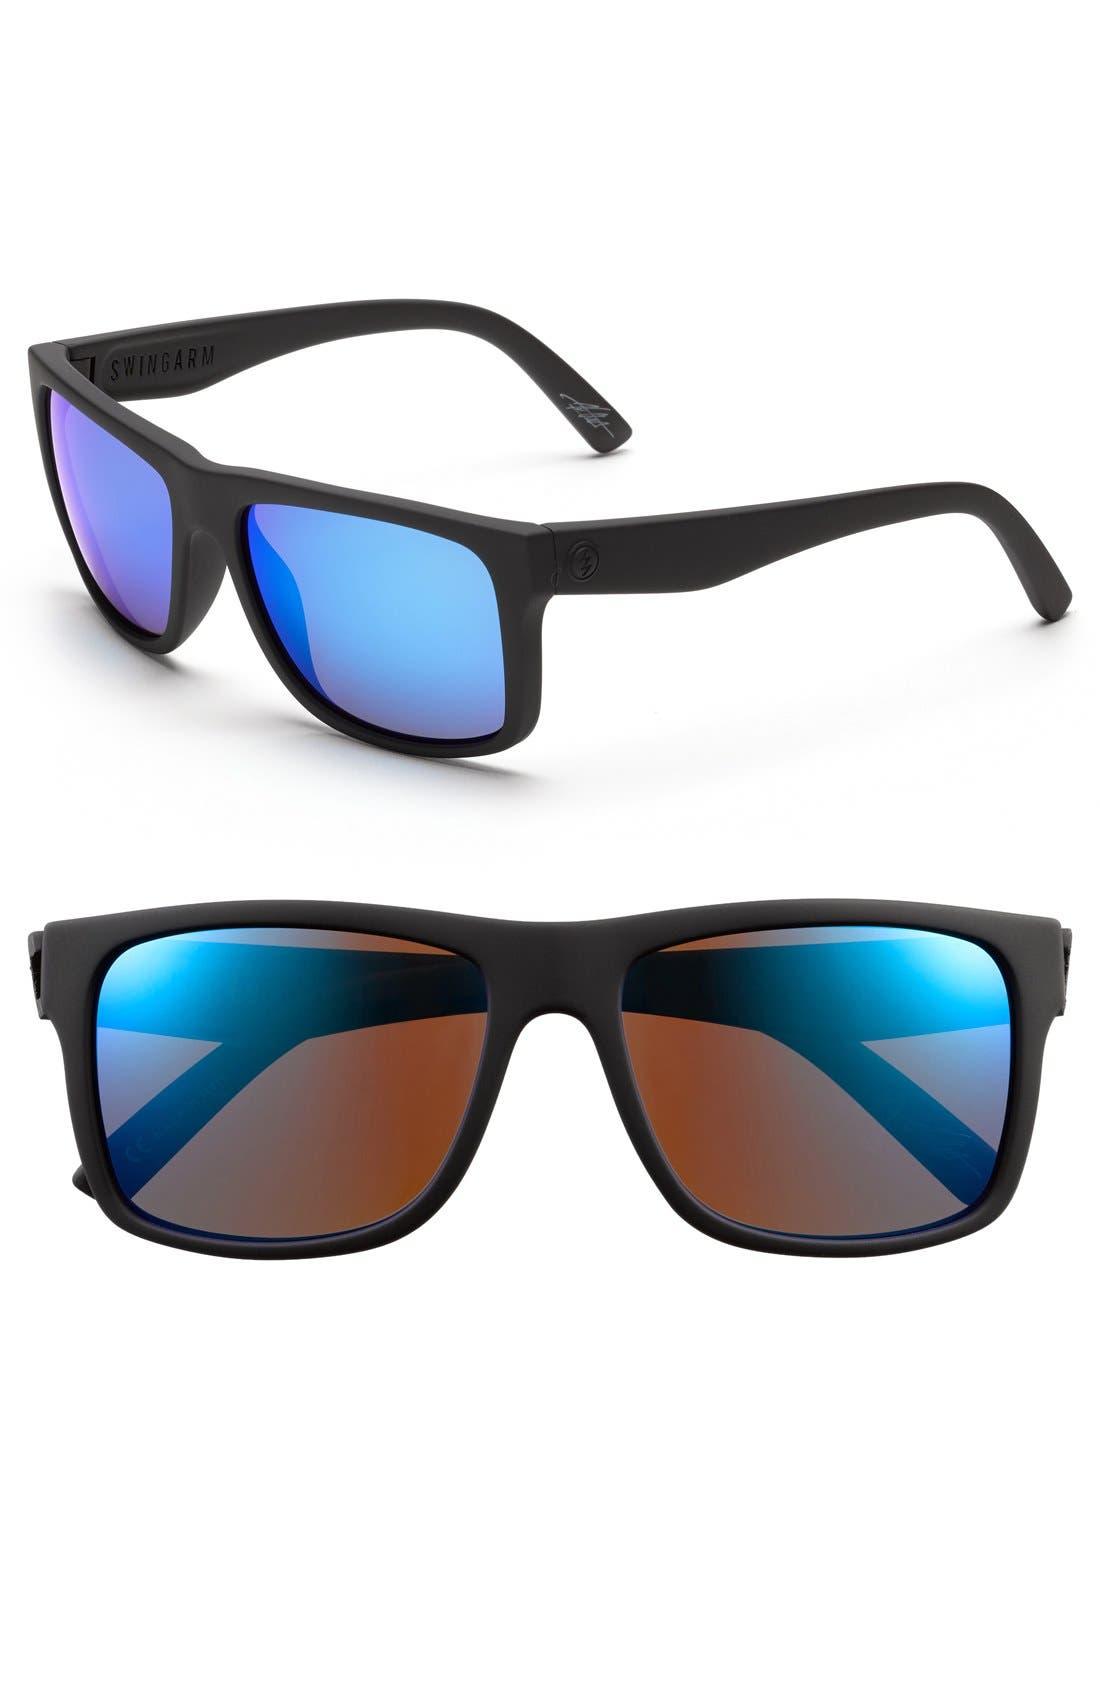 ELECTRIC 'Swingarm' 57mm Sunglasses